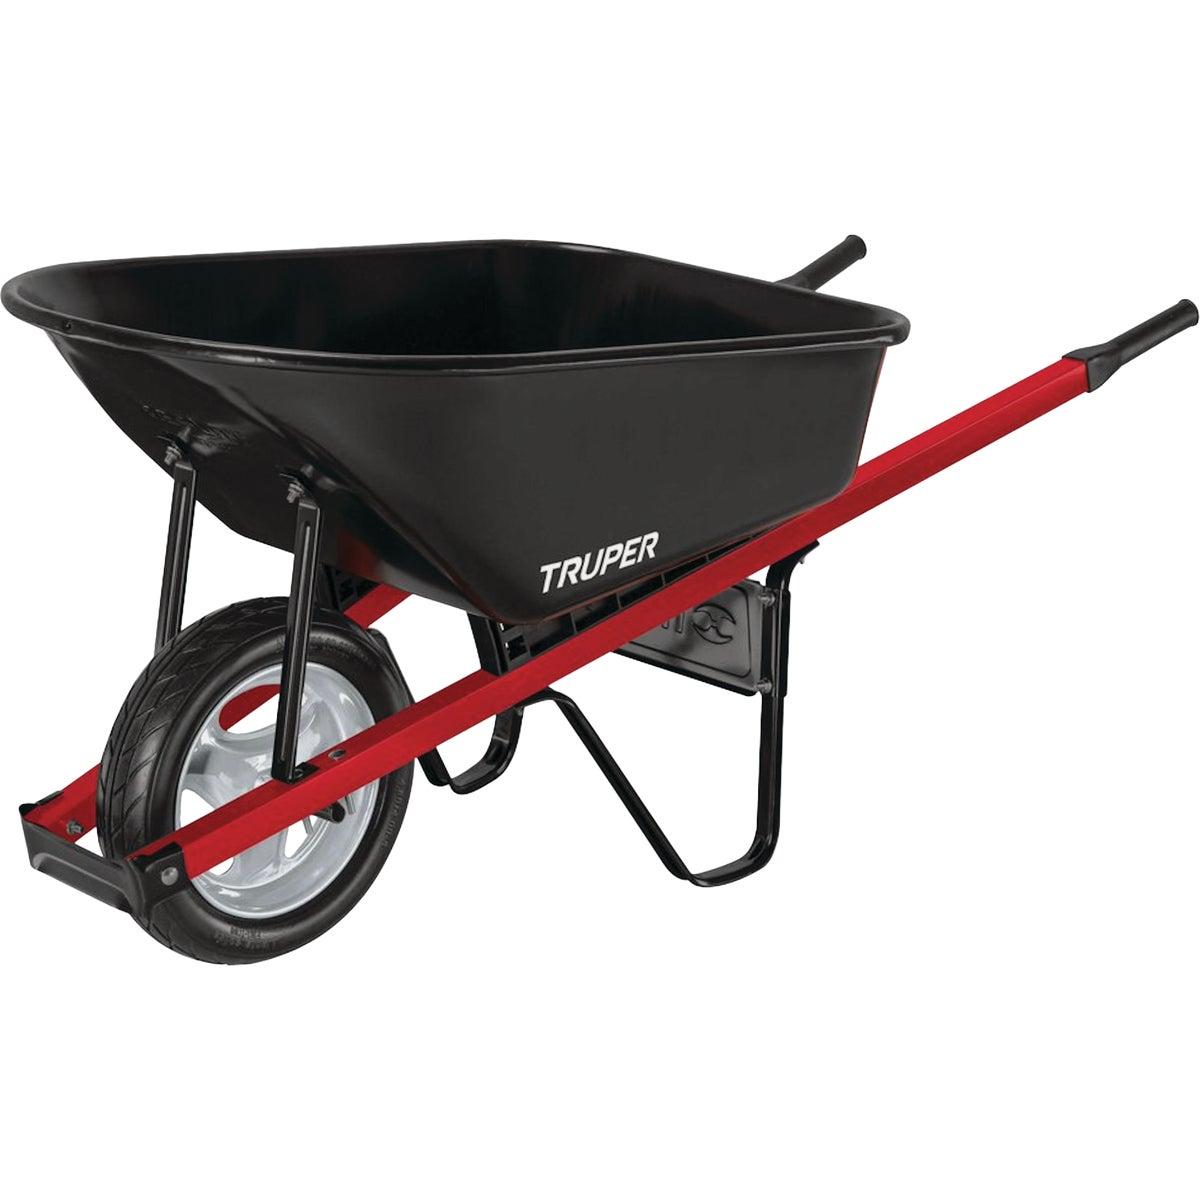 Truper Tru Tough Landscaper Steel Wheelbarrow, TM6-SF-G